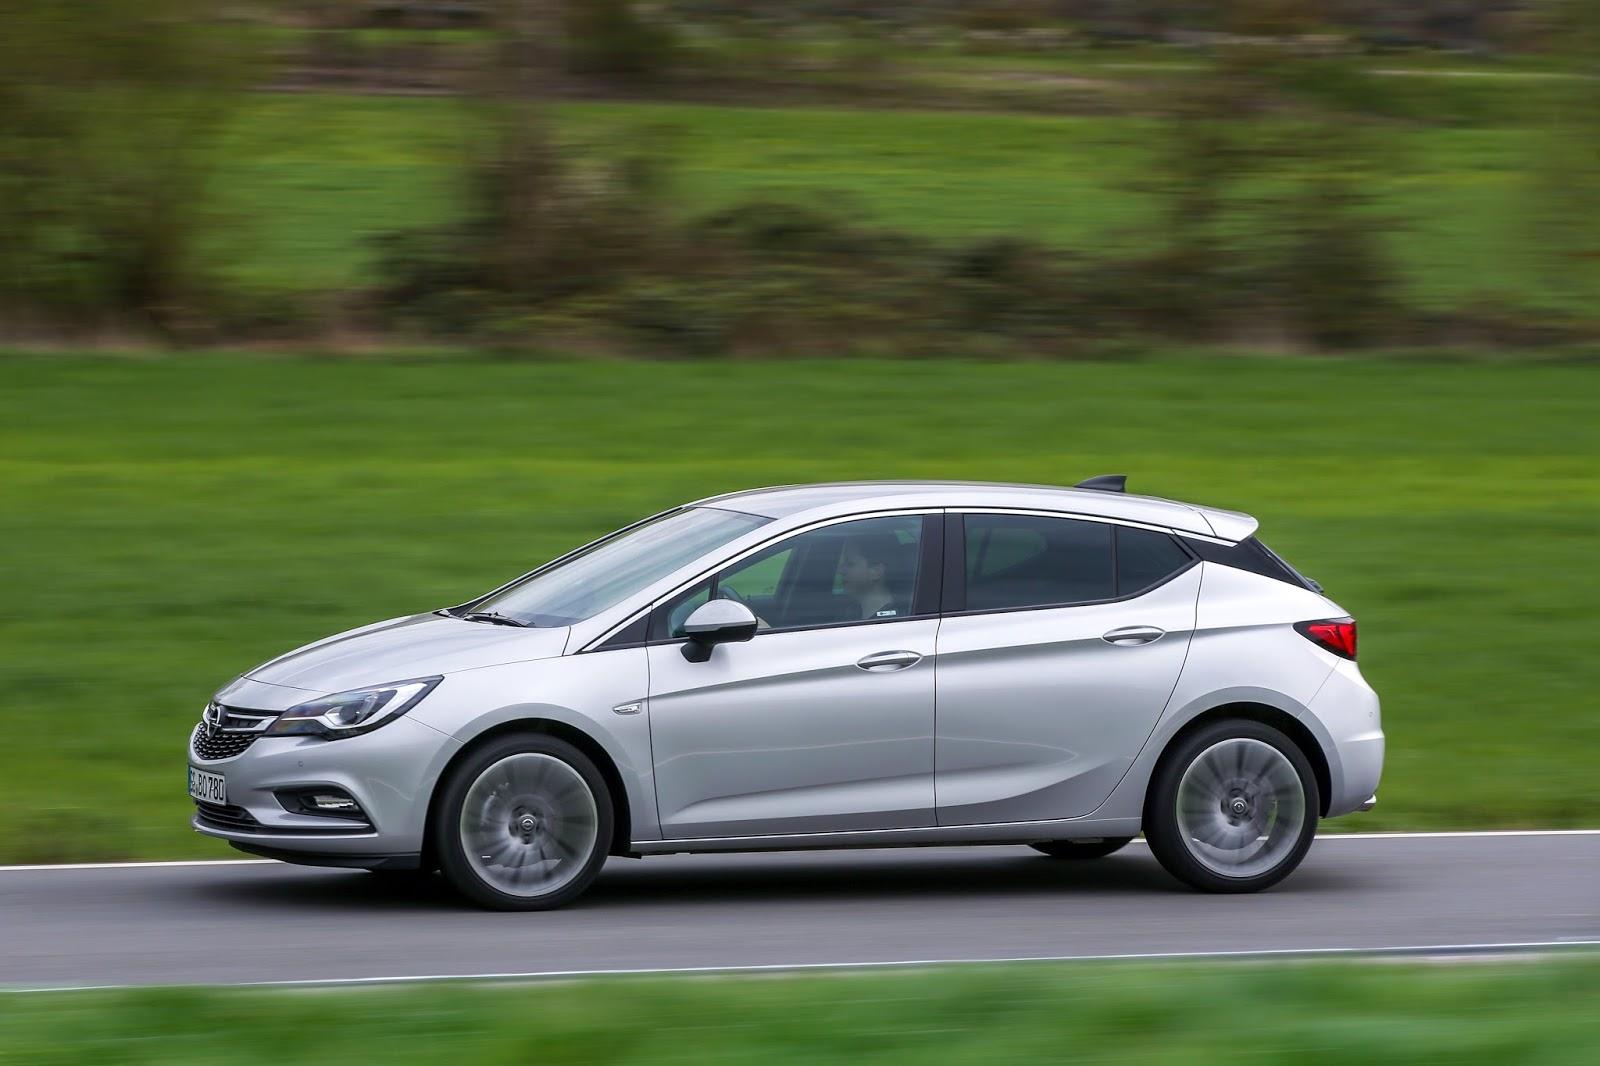 Opel Astra BiTurbo 5 door 301322 Το καυτό Opel Astra BiTurbo diesel συνδυάζει τις επιδόσεις με την οικονομία! Hatchback, Opel, Opel Astra, Opel Astra BiTurbo, Opel Astra BiTurbo Hatchback, twin-turbo